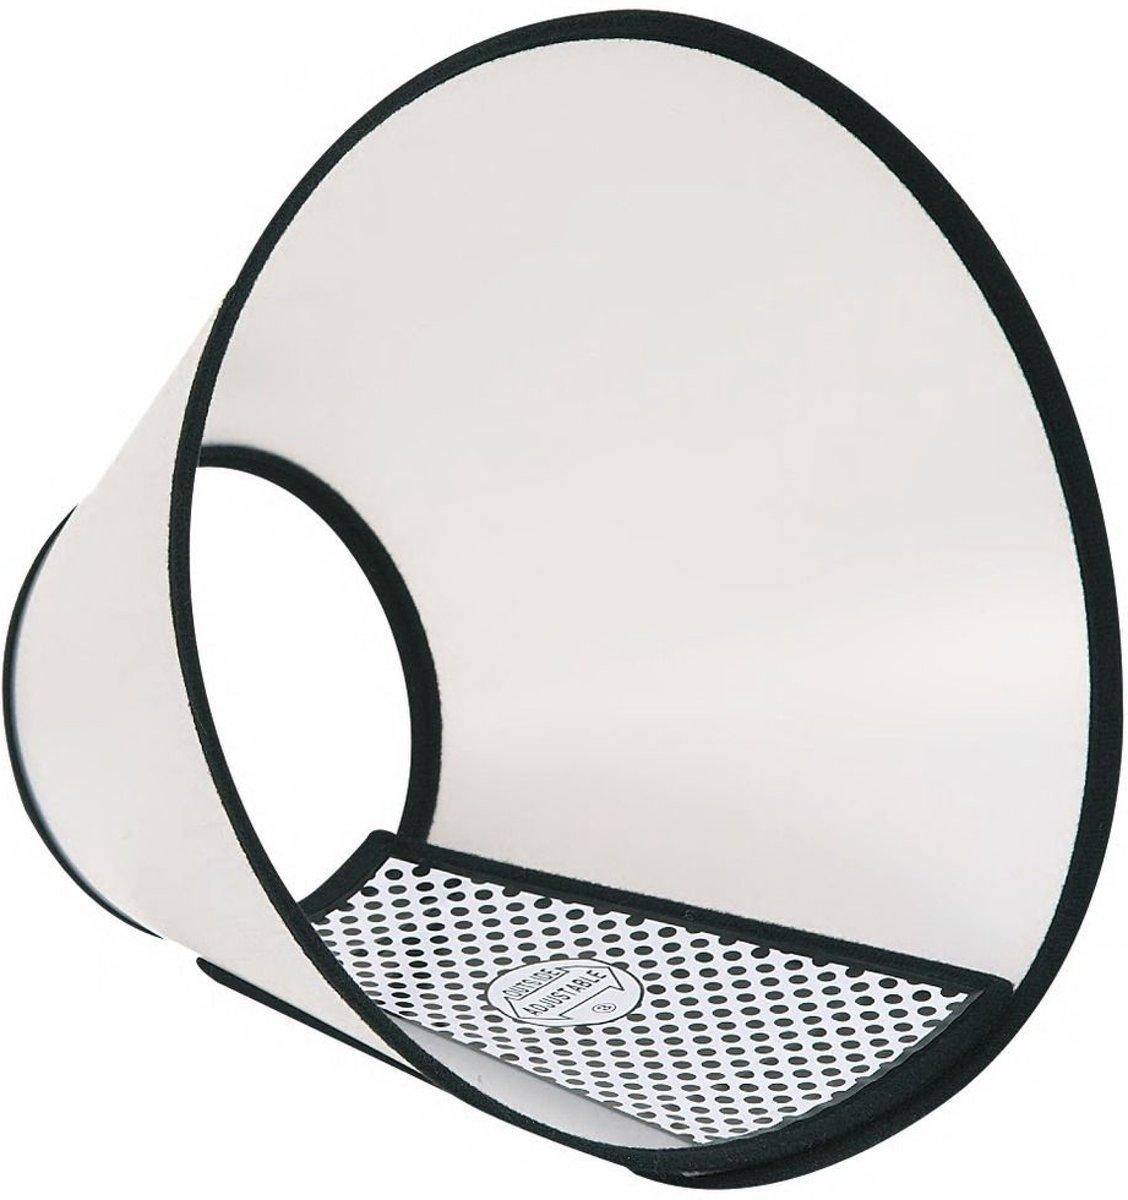 Neckcap 15-35cm, plastic kopen